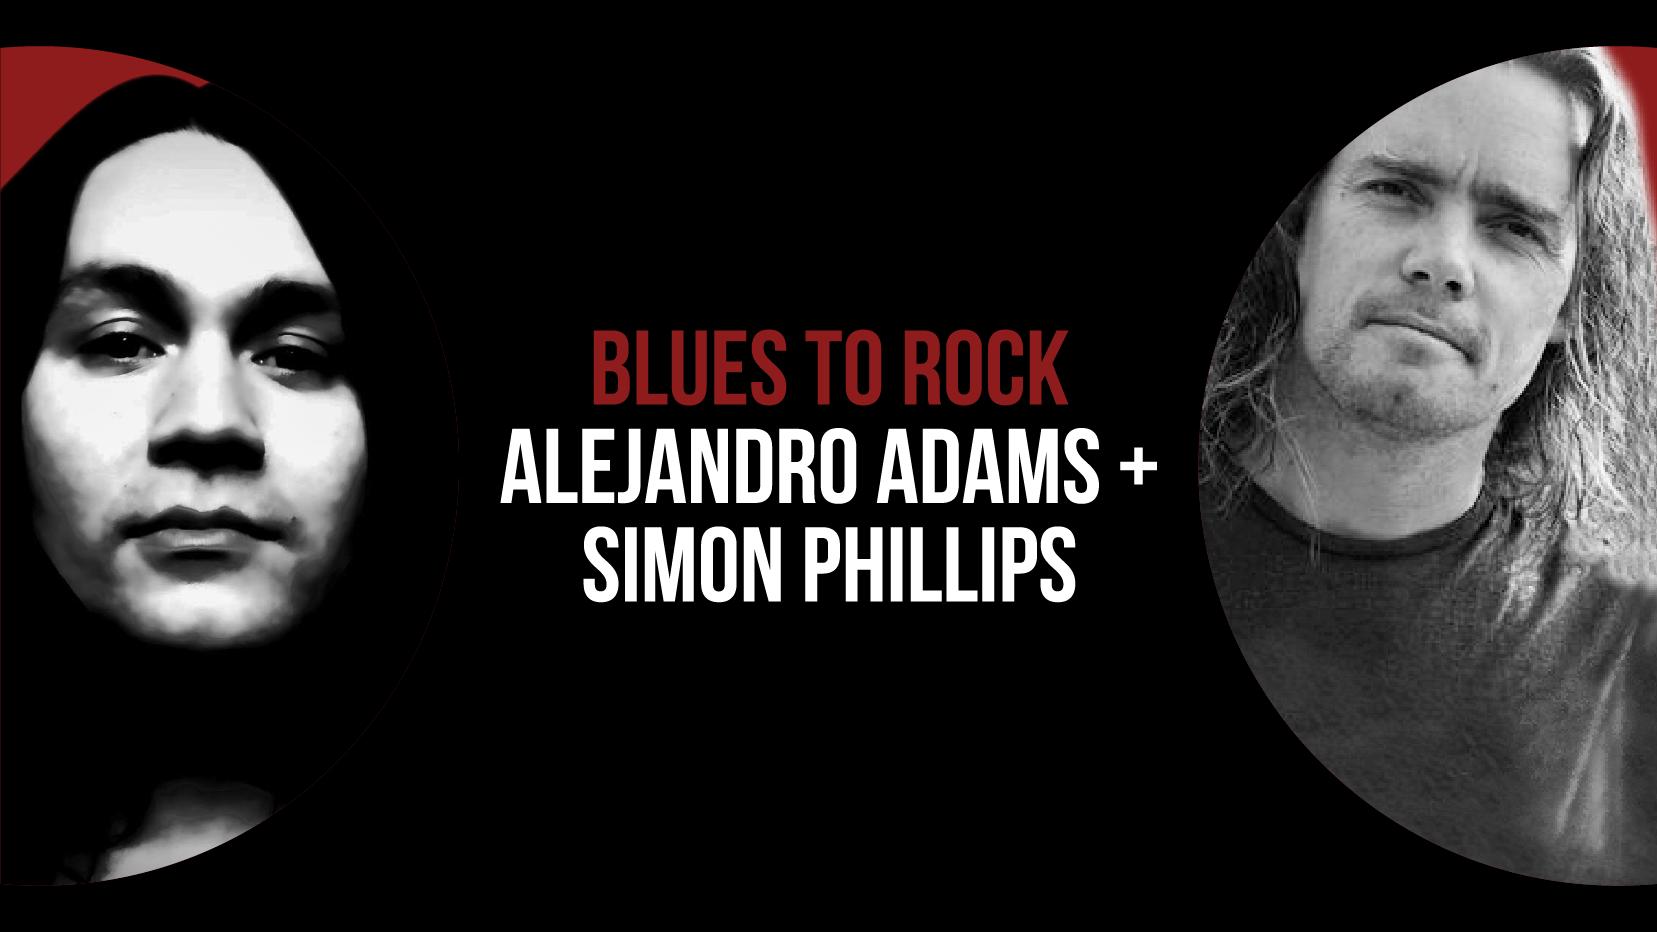 Alejandro Adams and Simon Phillips